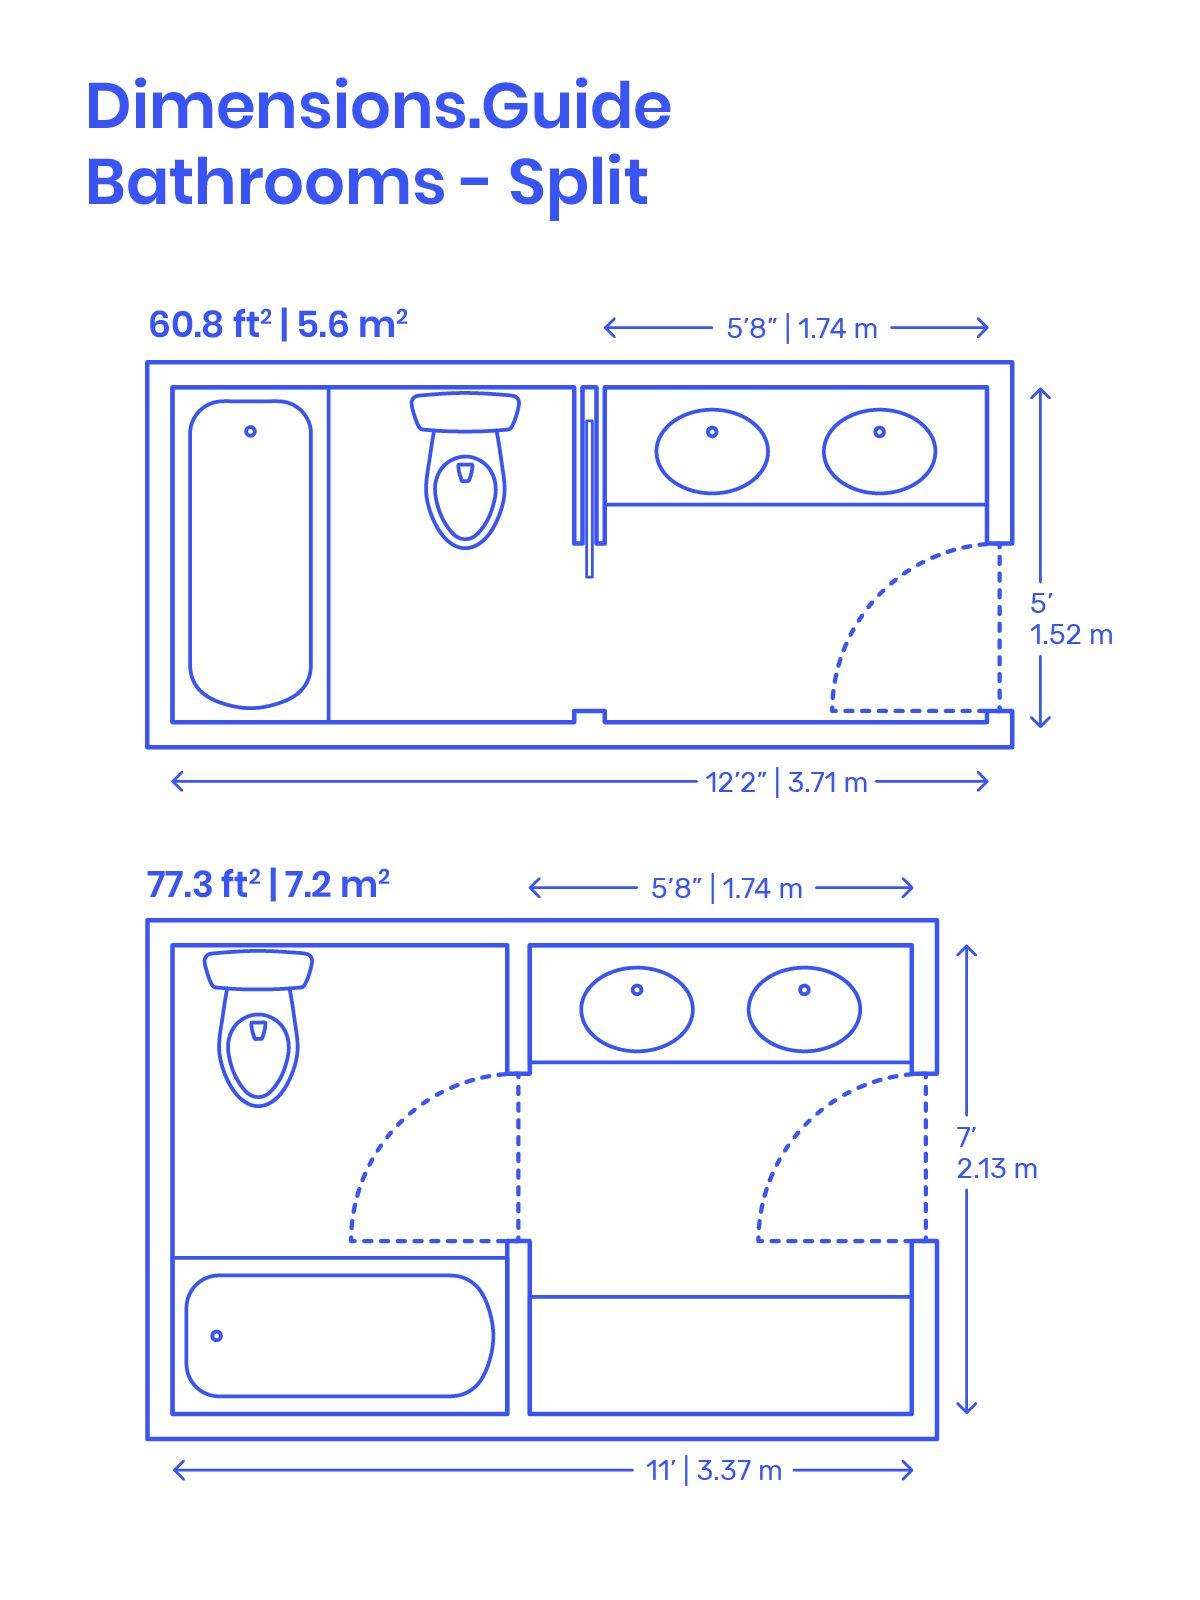 Split Bathrooms Bathroom Dimensions Bathroom Plans Bathroom Floor Plans